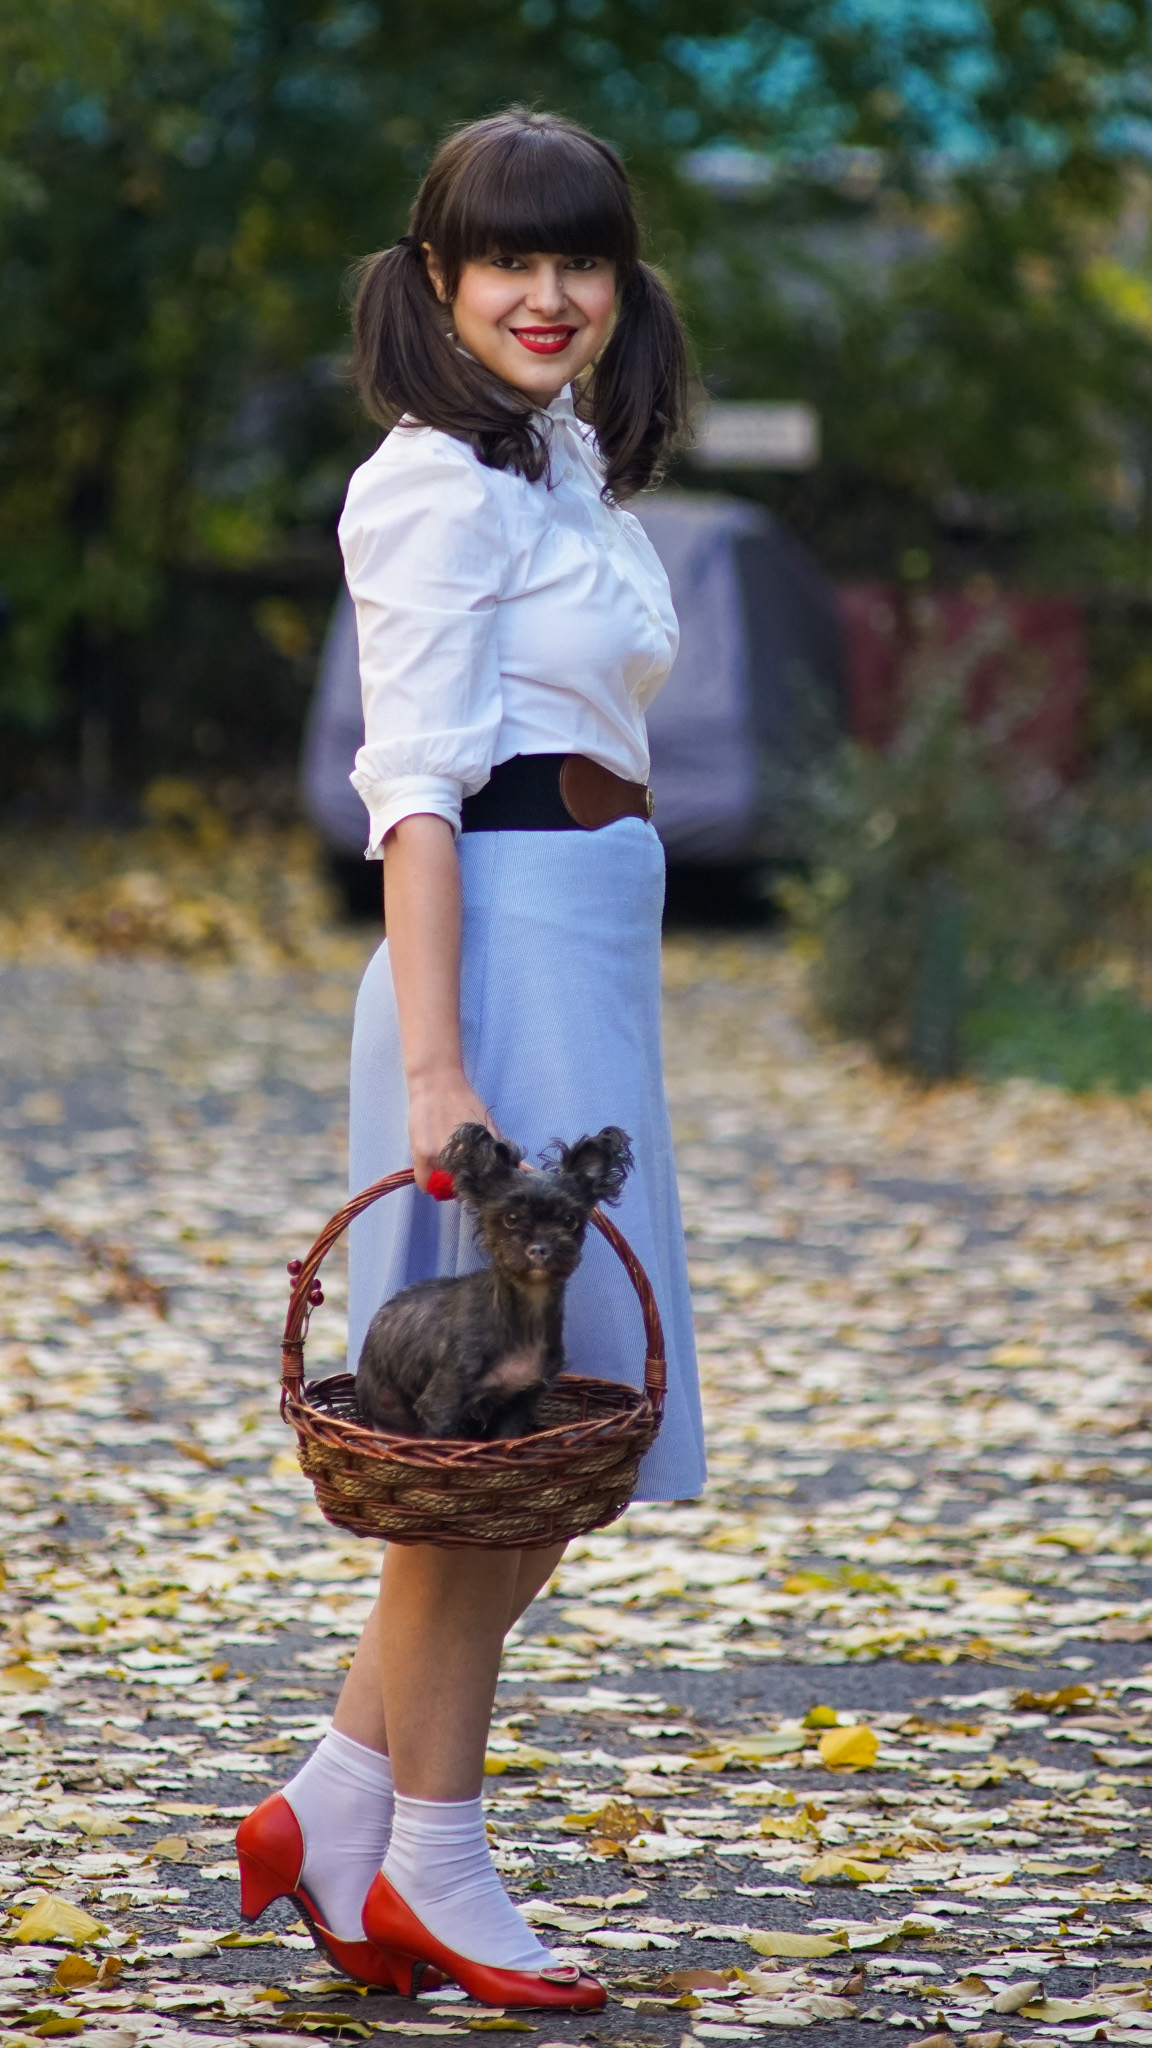 easy DIY Halloween costume dorothy white shirt blue skirt basket dog doggy stuffed toy stuffed bear red shoes white socks pony tails girly autumn